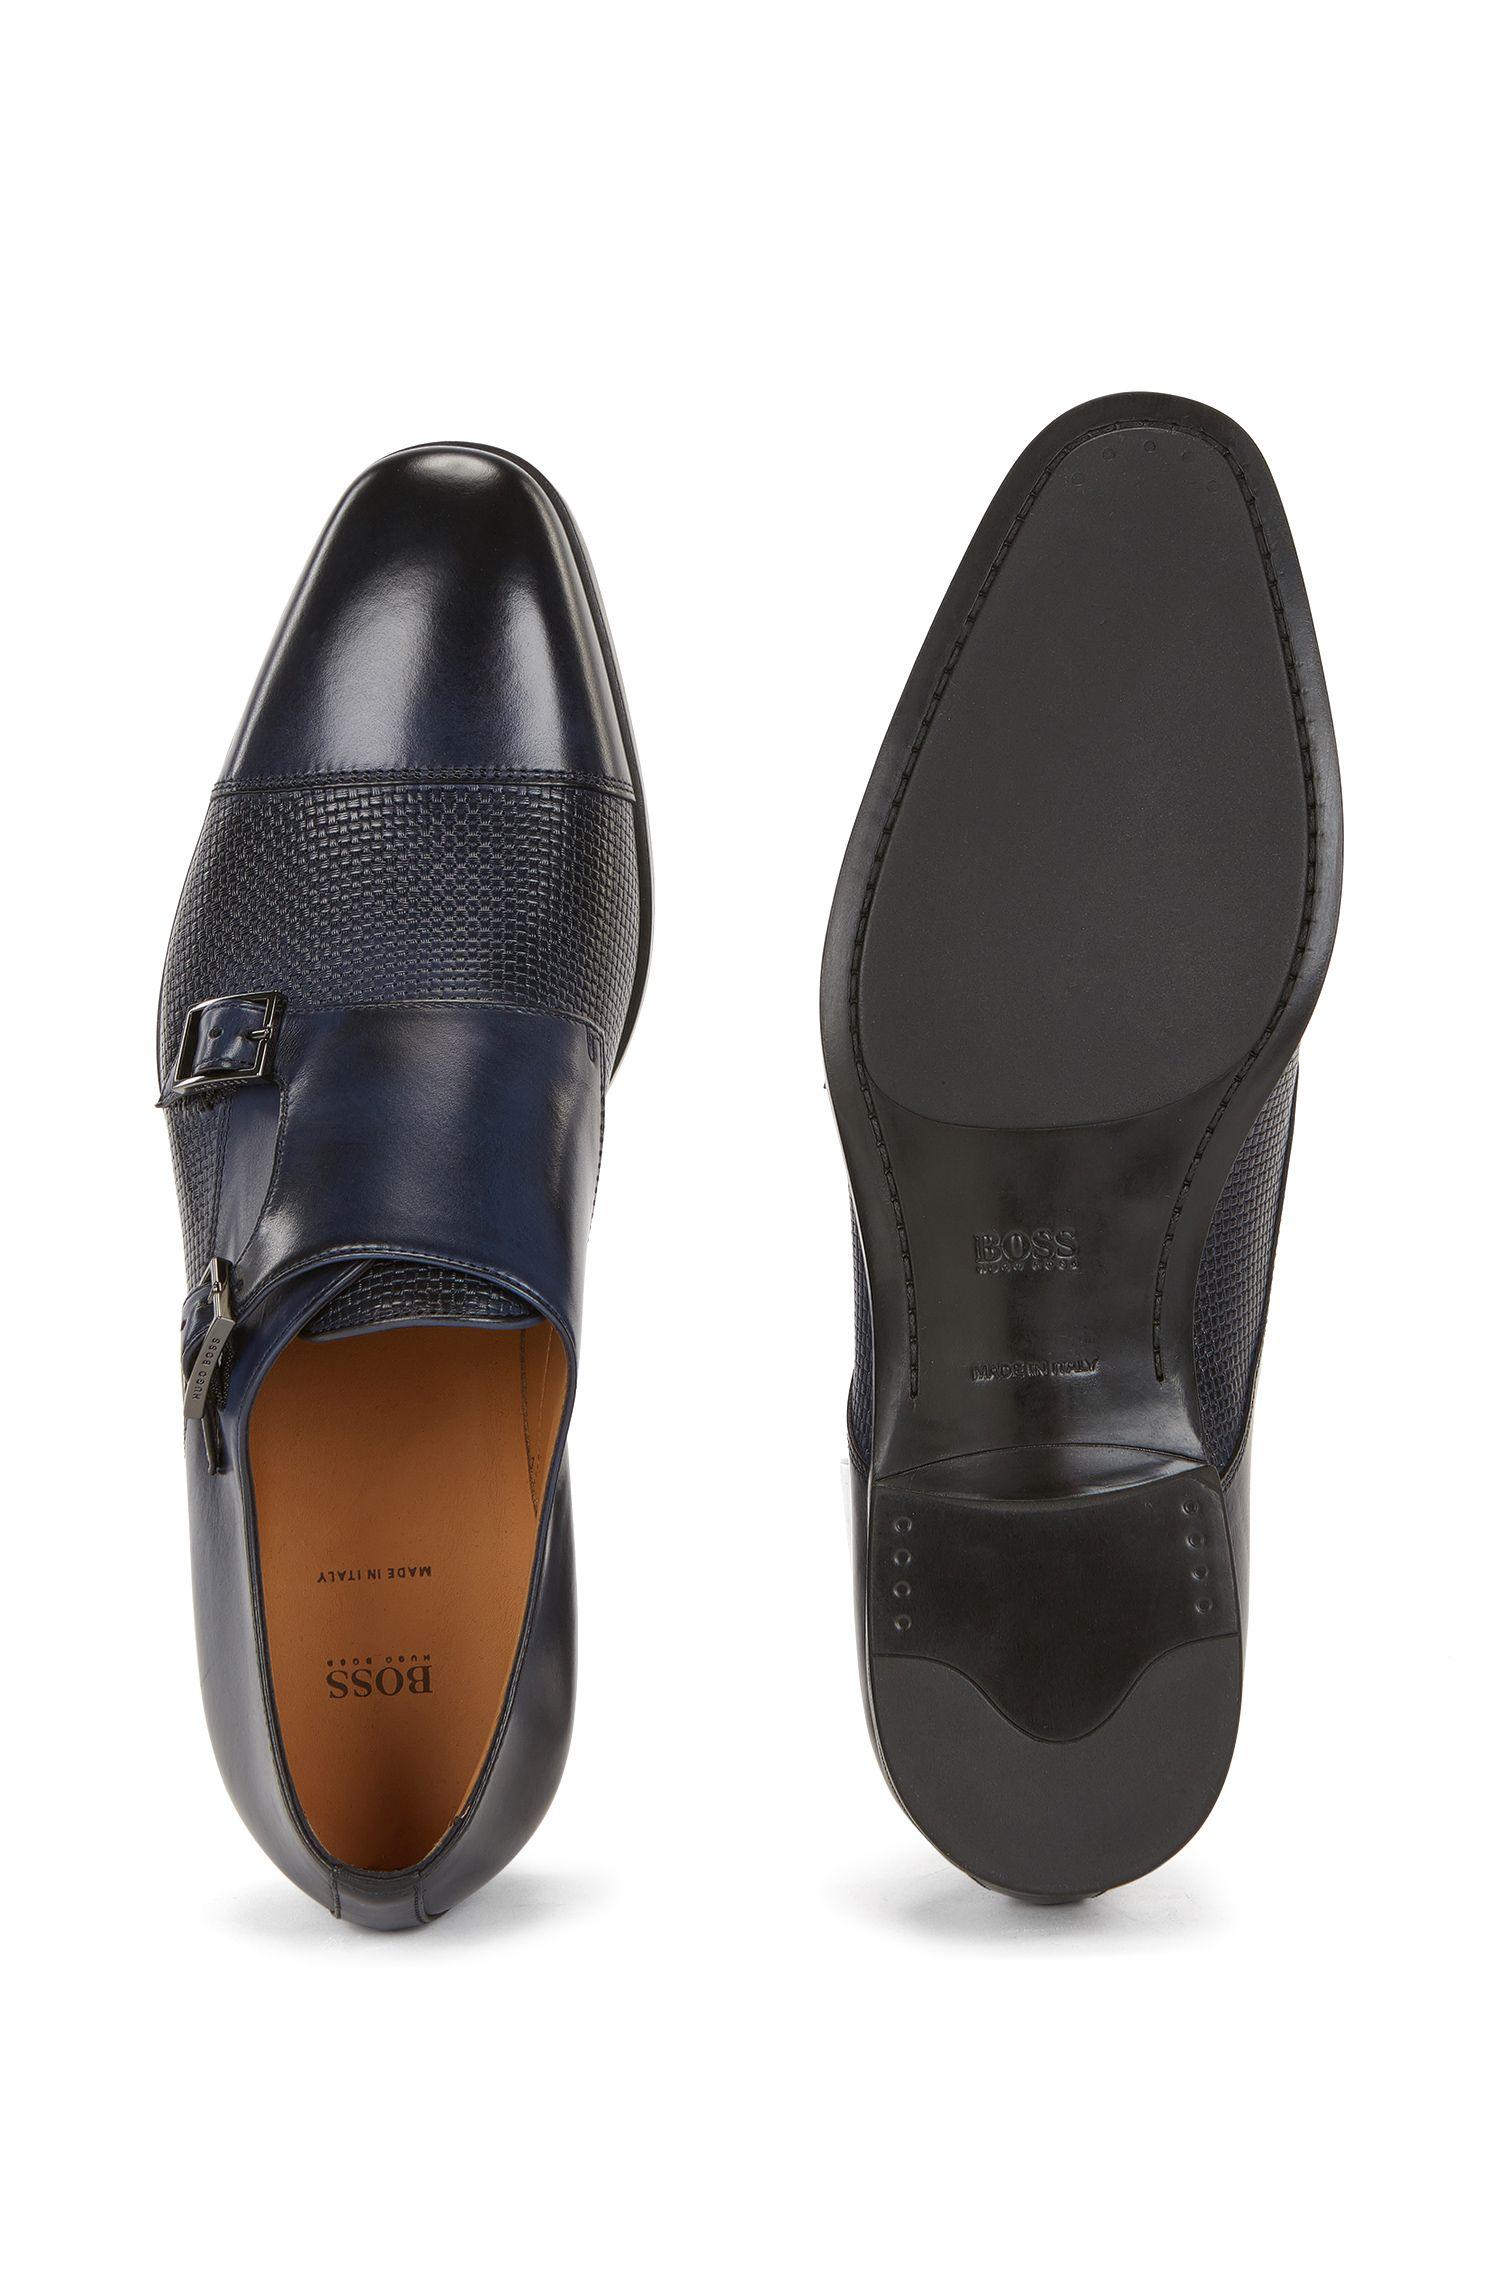 Doppelte Monkstraps aus glattem und geprägtem Leder